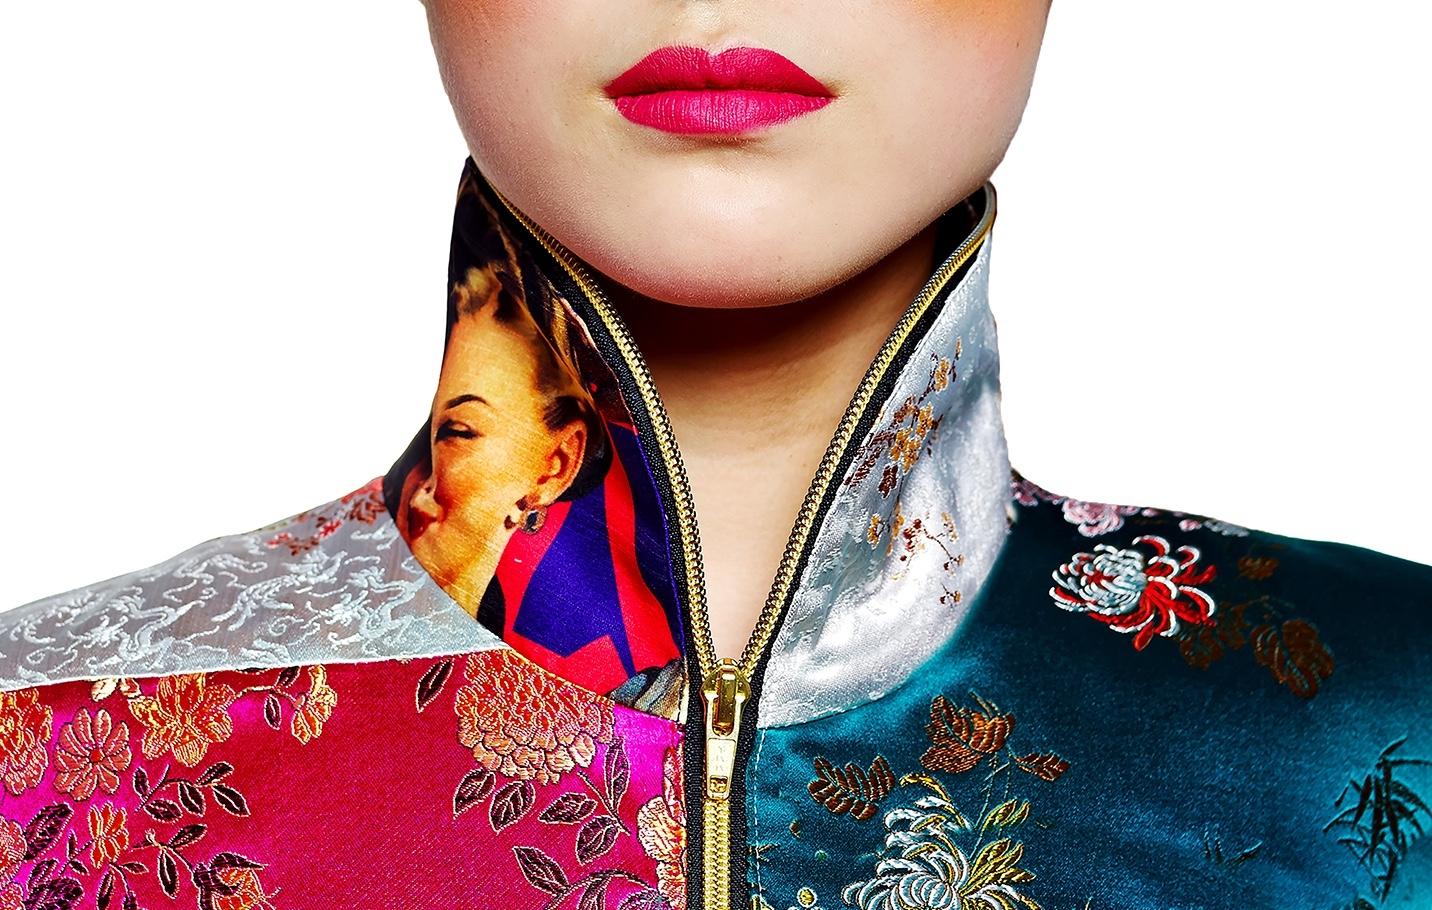 FAKY-384-385-Kansai-Path-jacket.--show-2014.poster..marie.dancer-2posterNew.-Arrowsmith©-MaisonSensey